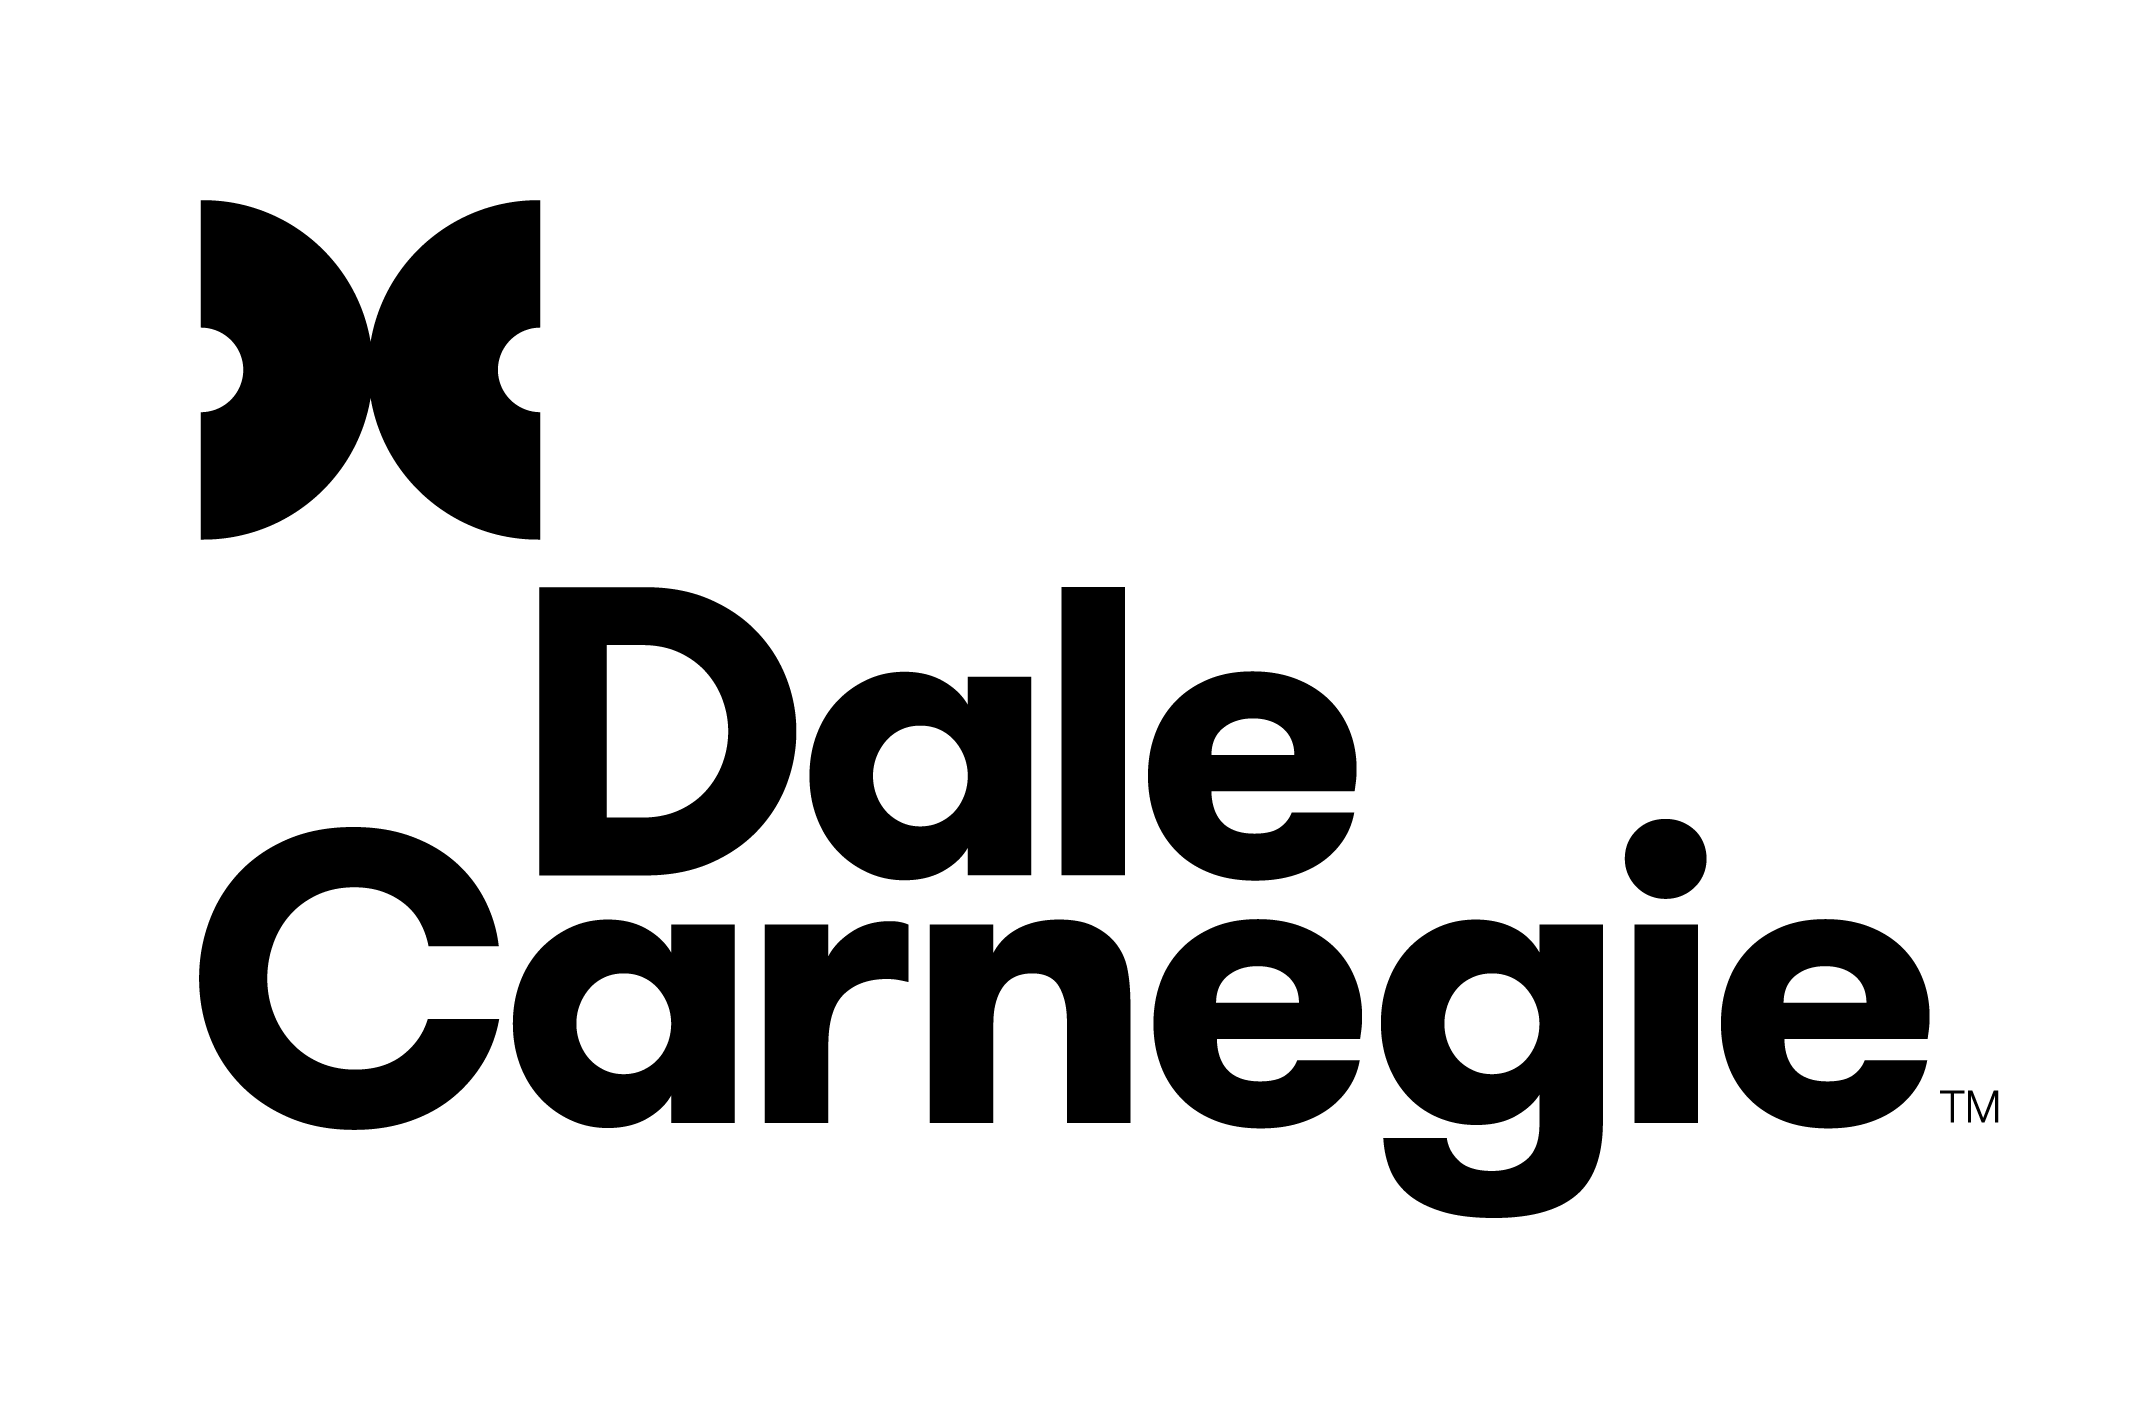 K2 DEVELOPPEMENT